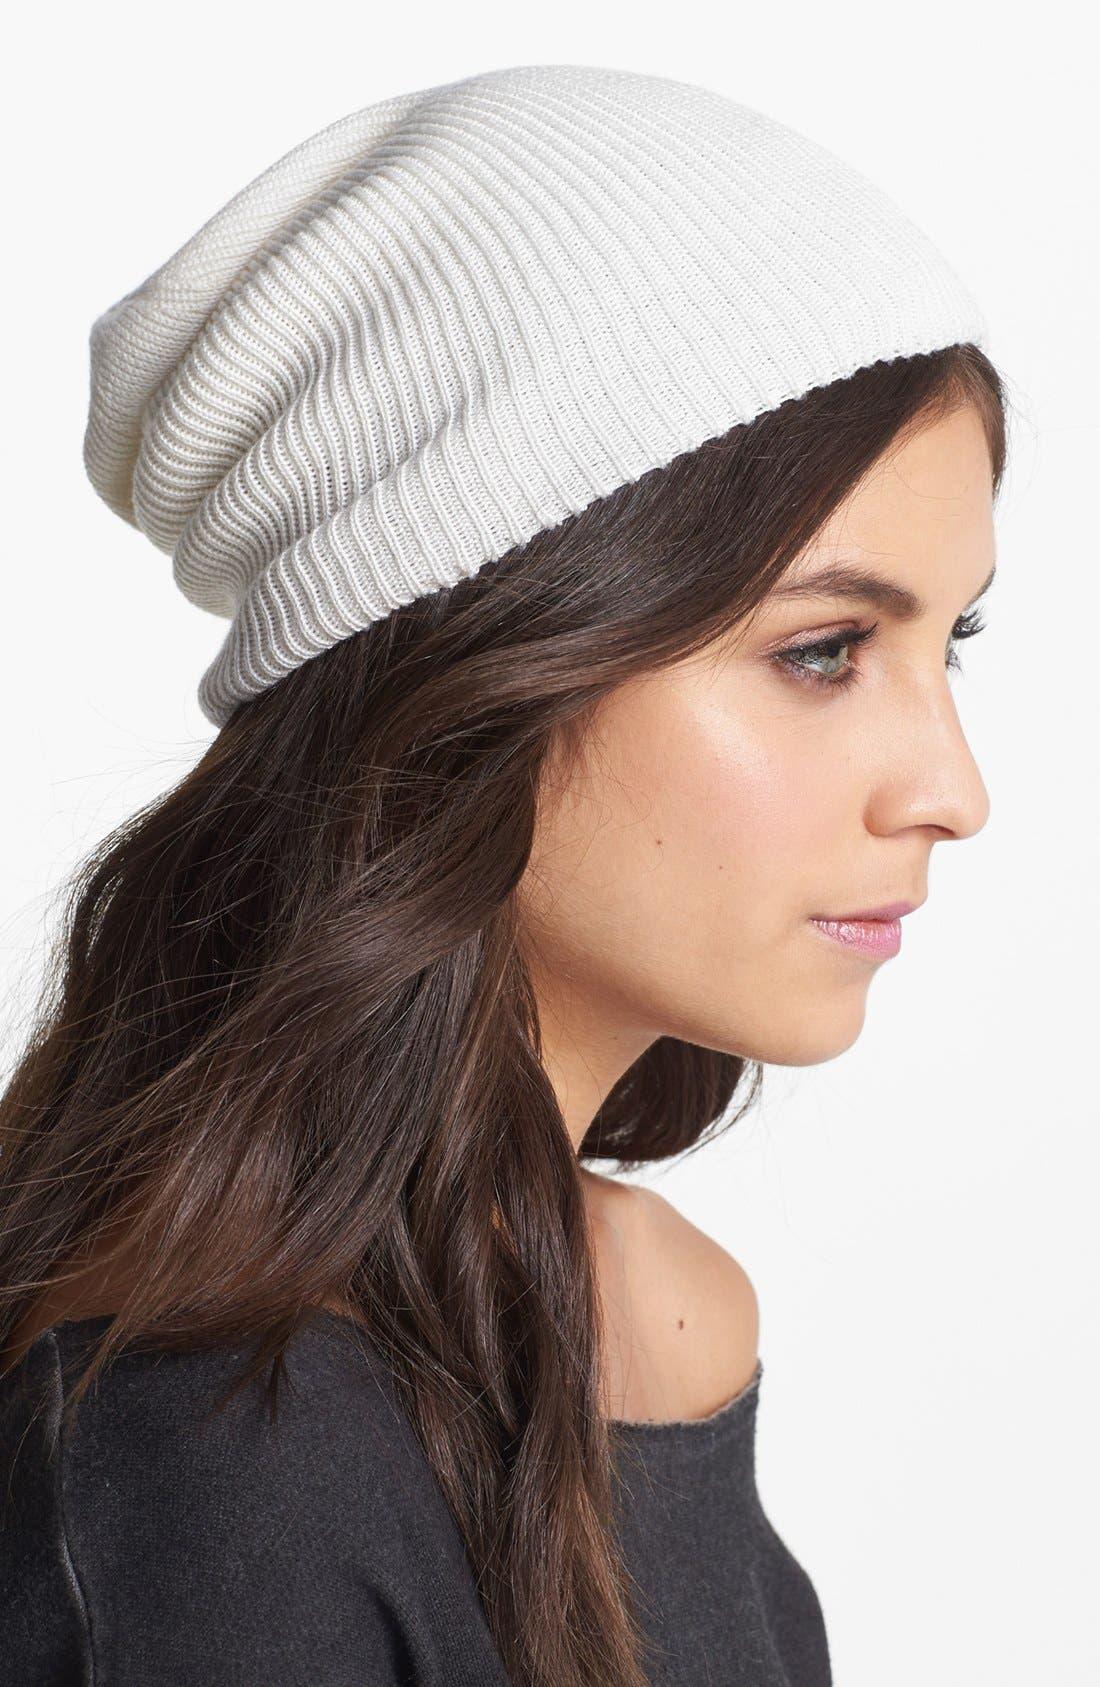 Alternate Image 1 Selected - Echo 'Seasonless' Slouchy Knit Cap